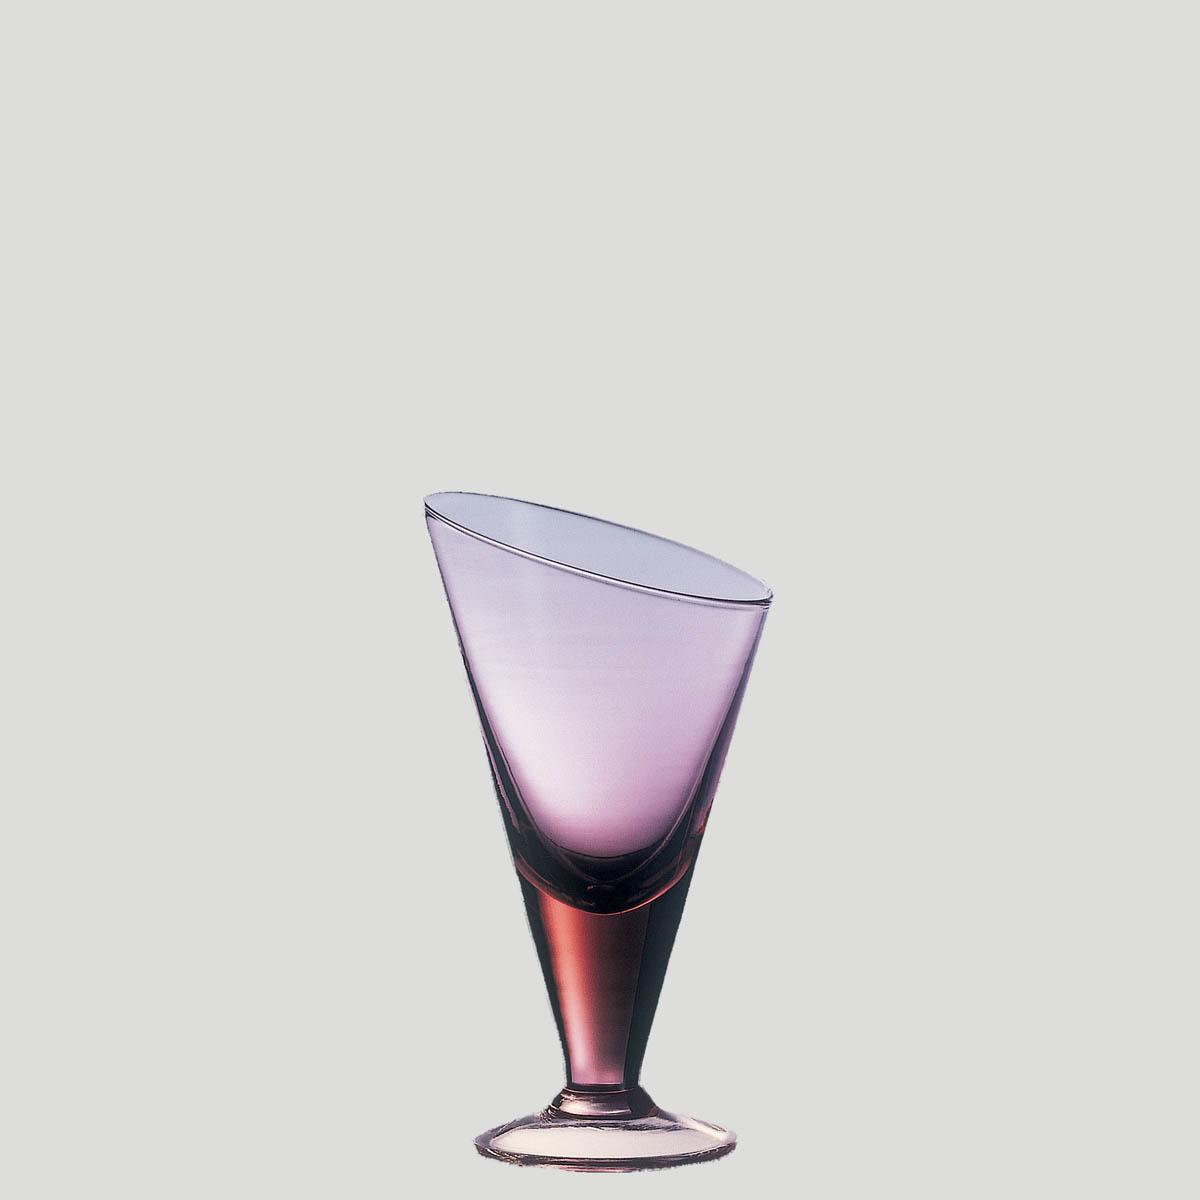 Edelweiss fischio medio - Coppa per gelato in vetro - Gardagel